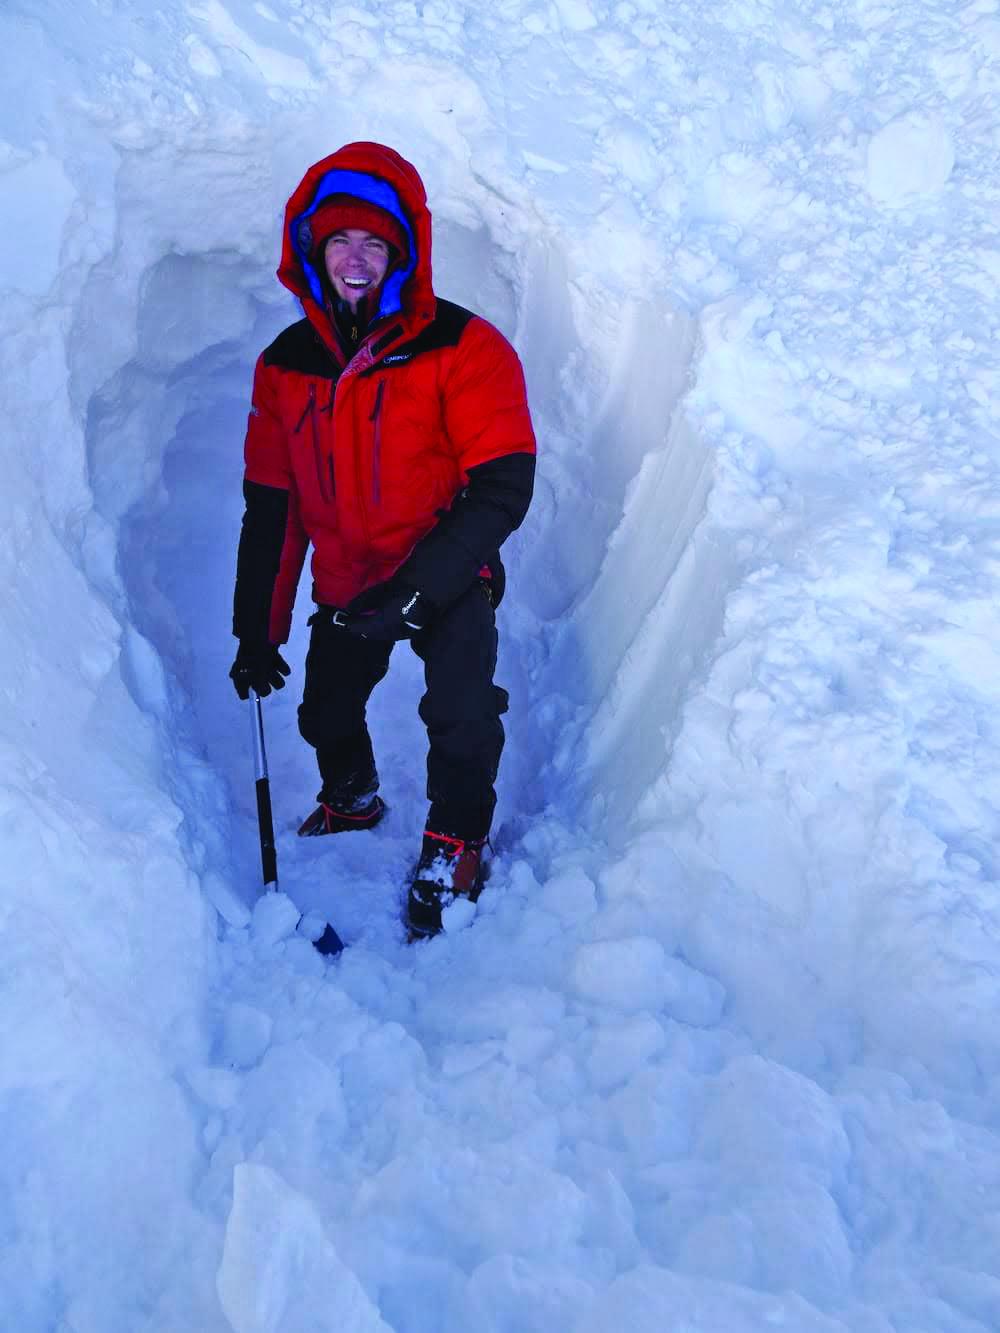 Tom Ballard shovels out a snow cave on Nanga Parbat. Photo: Daniele Nardi.